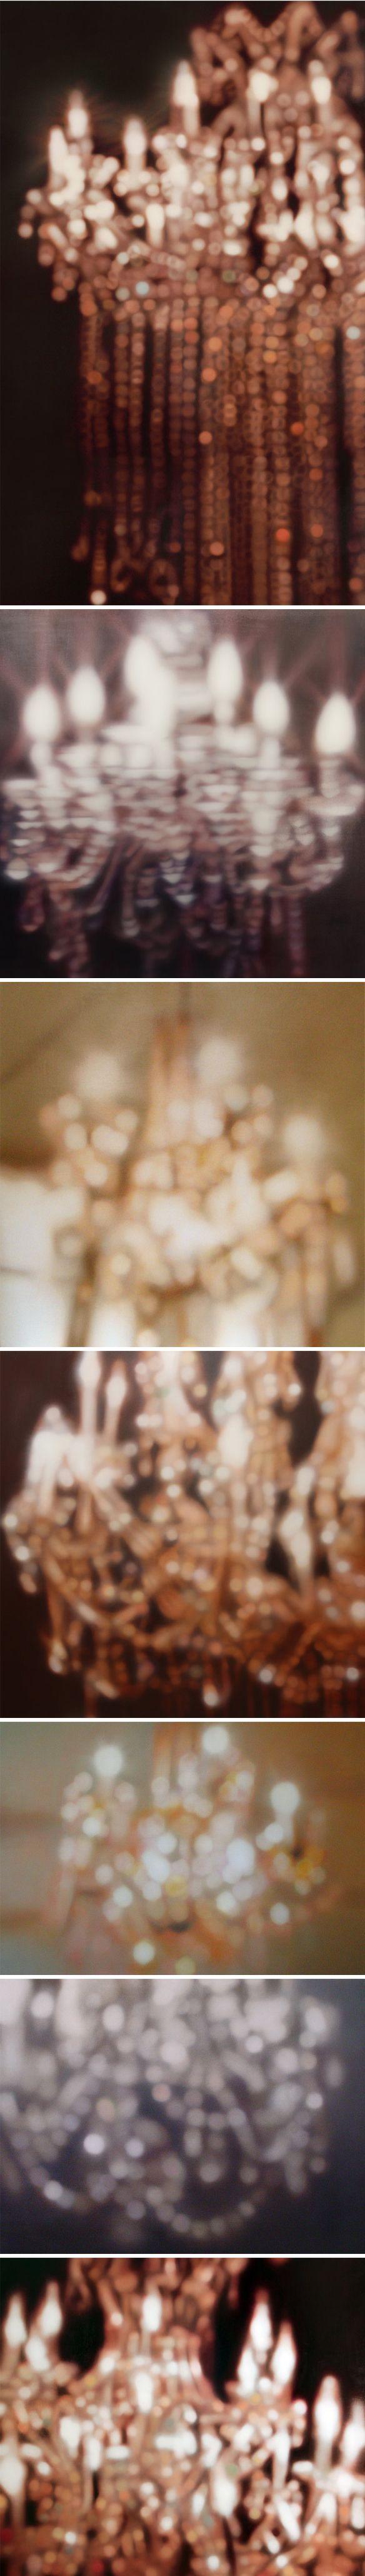 oil paintings by laura wood #chandelier